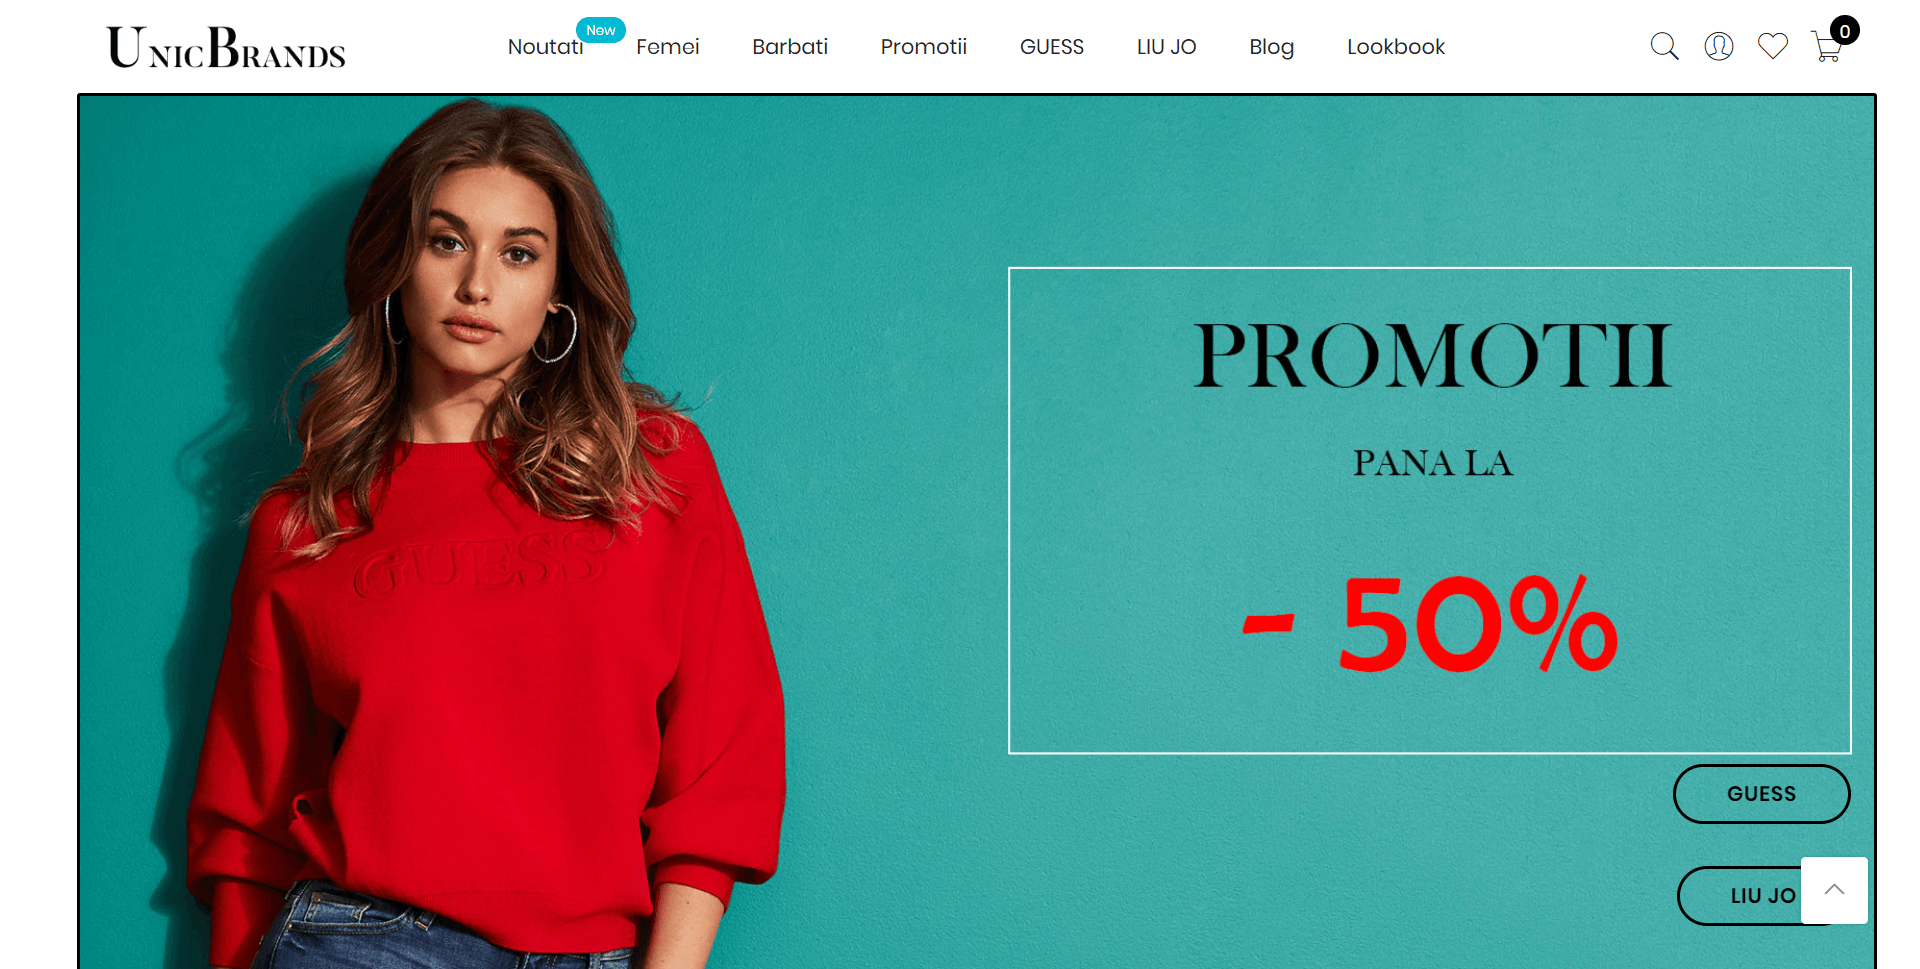 Unic Brands